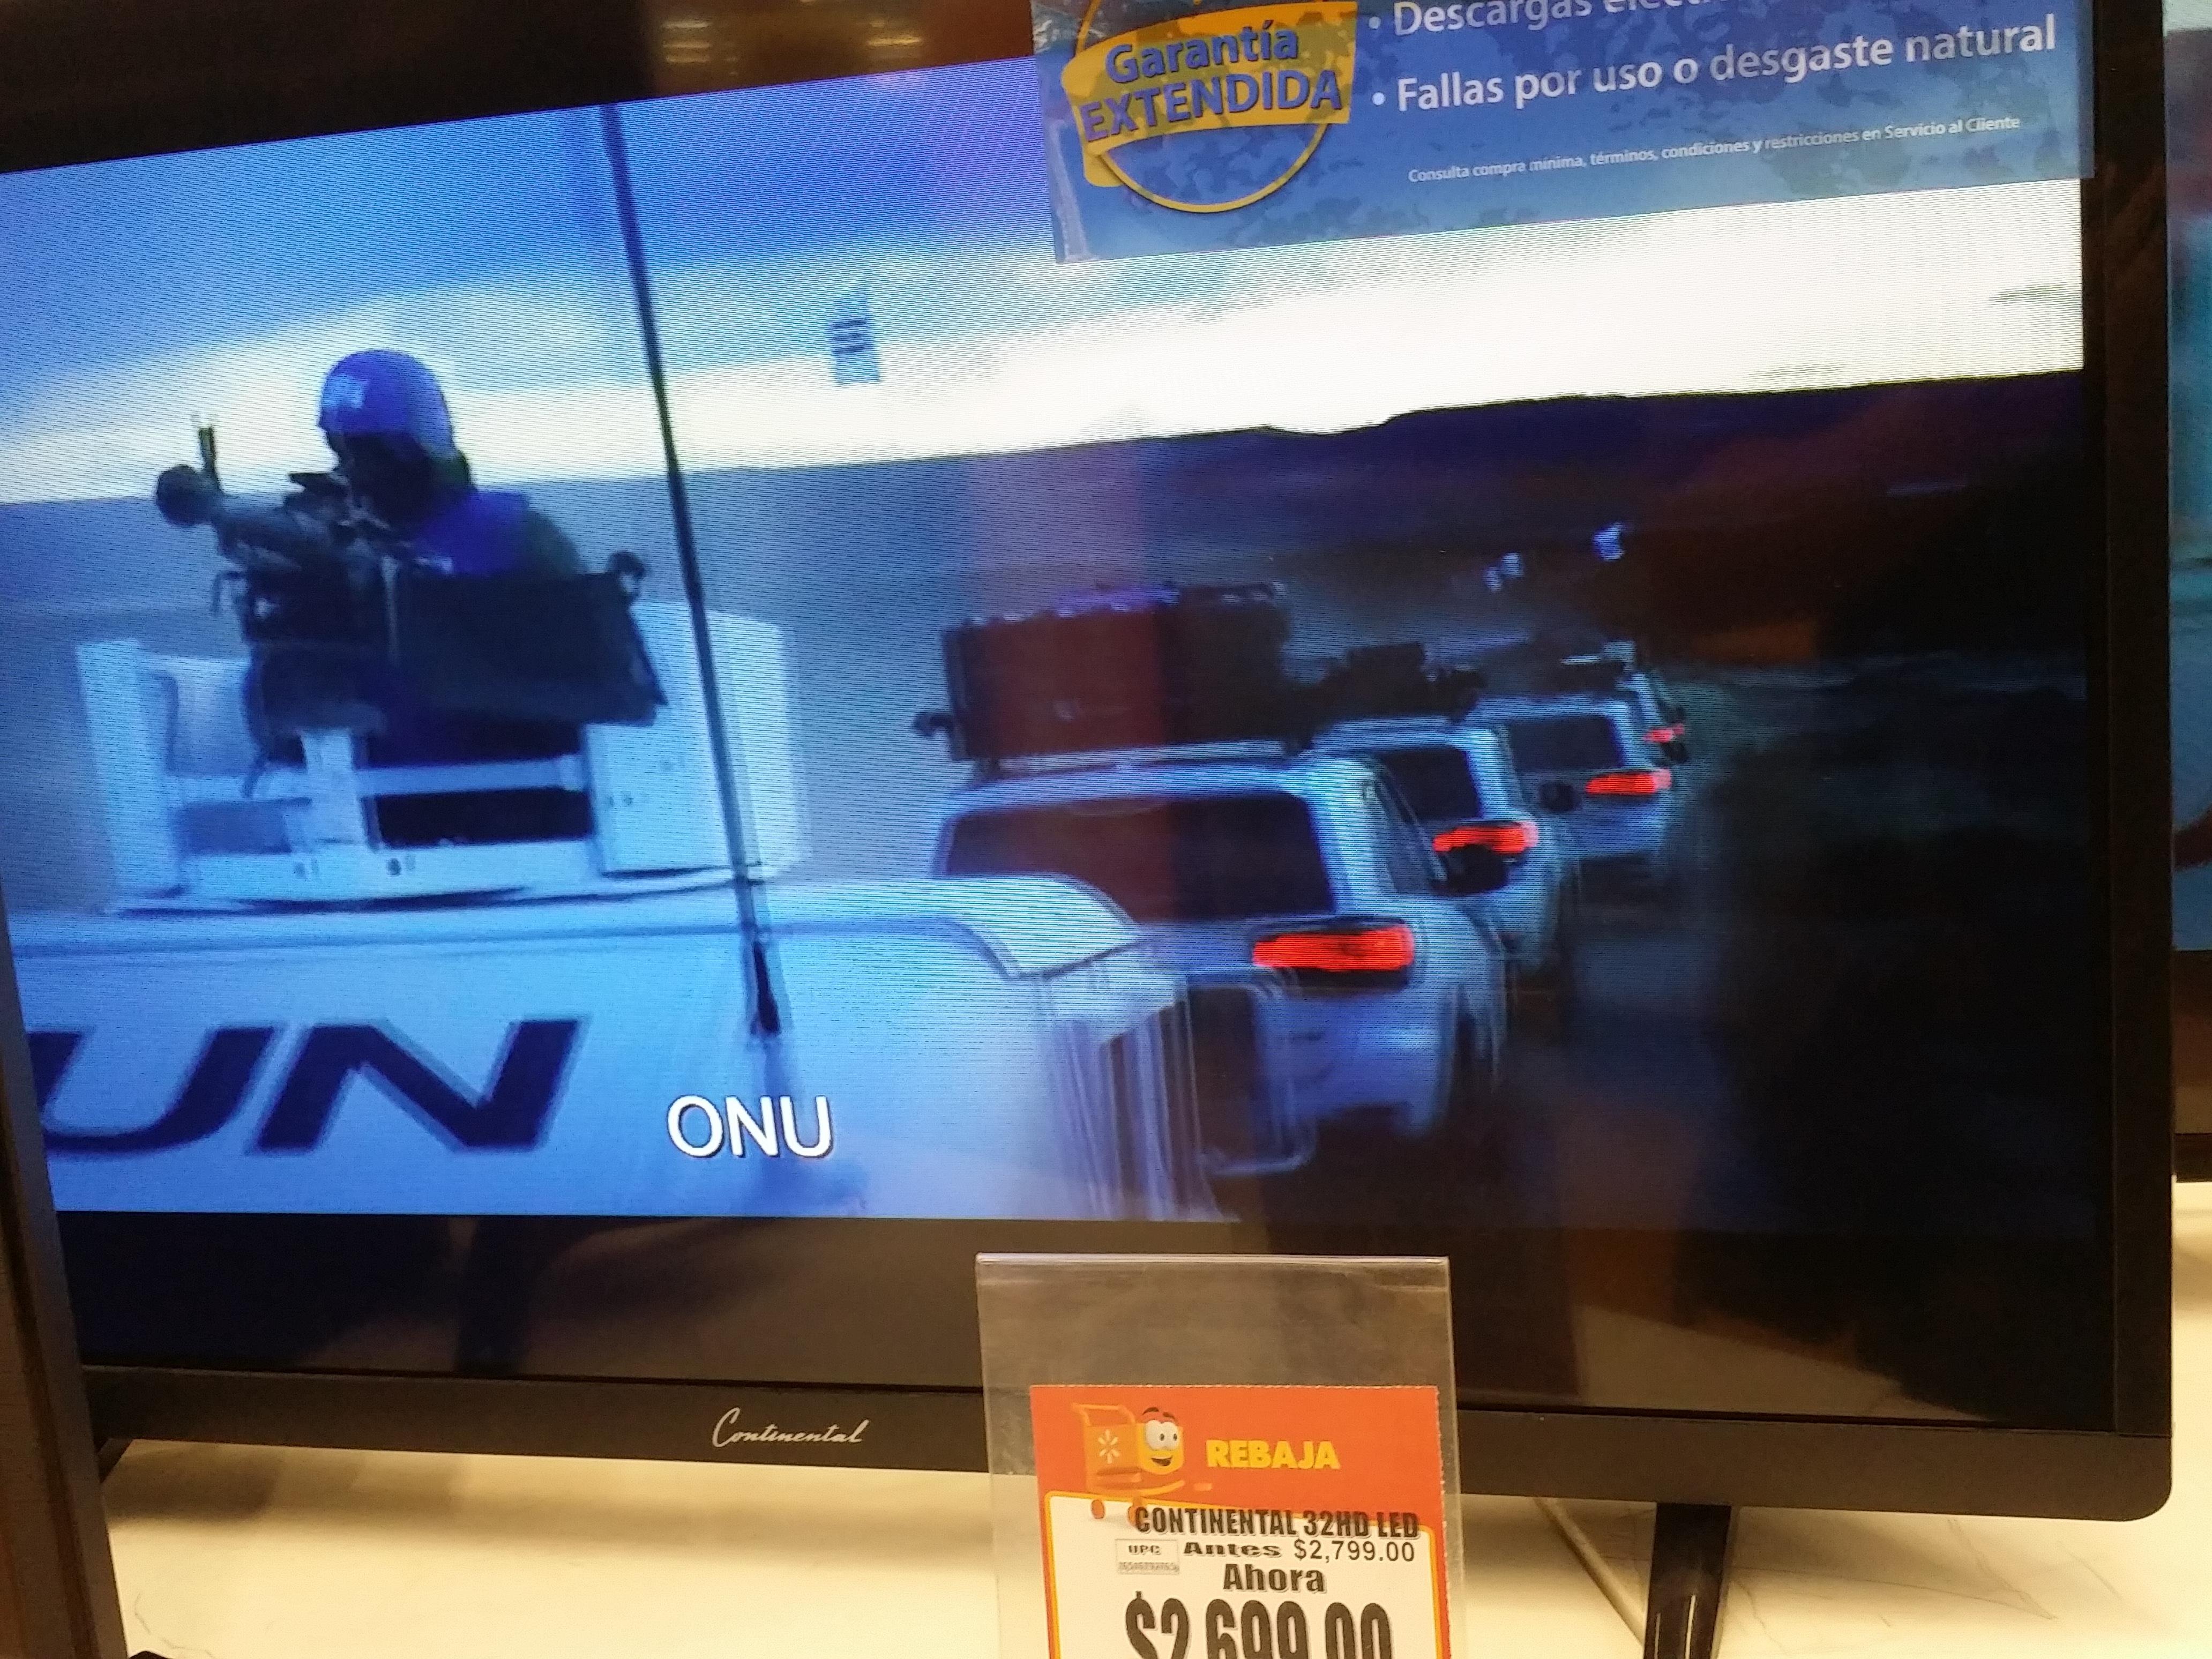 "Walmart: Pantalla 32"" marca Continental a $2,699"